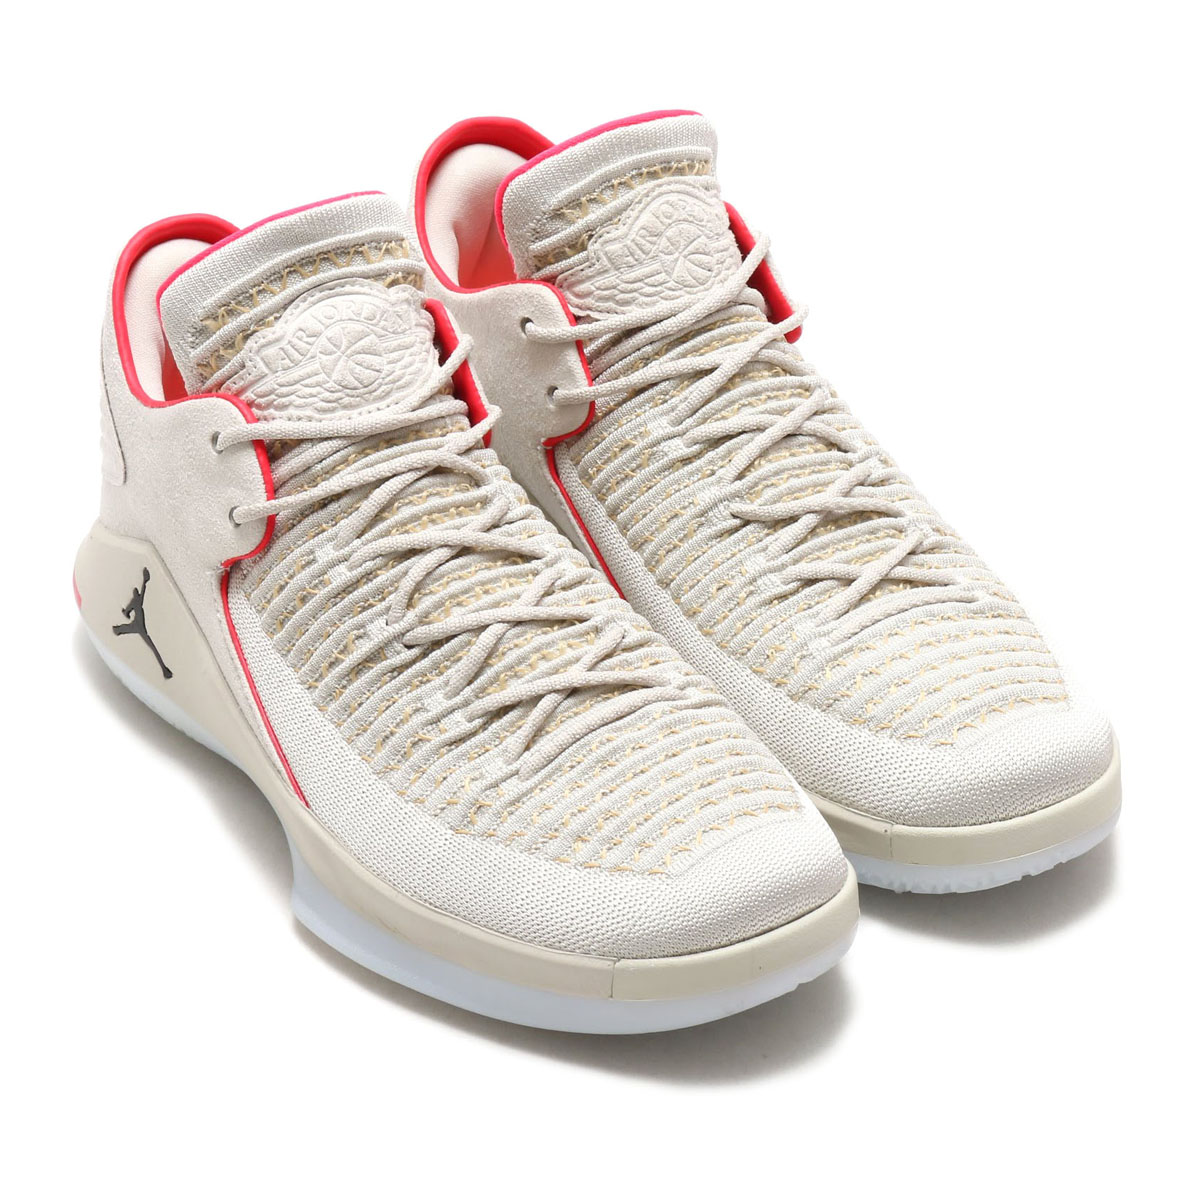 bbdeddd876803a NIKE AIR JORDAN XXXII LOW PF (Nike Air Jordan XXXII low PF) LIGHT BONE BLACK-VACHETTA  TAN-INFRARED 18SU-S